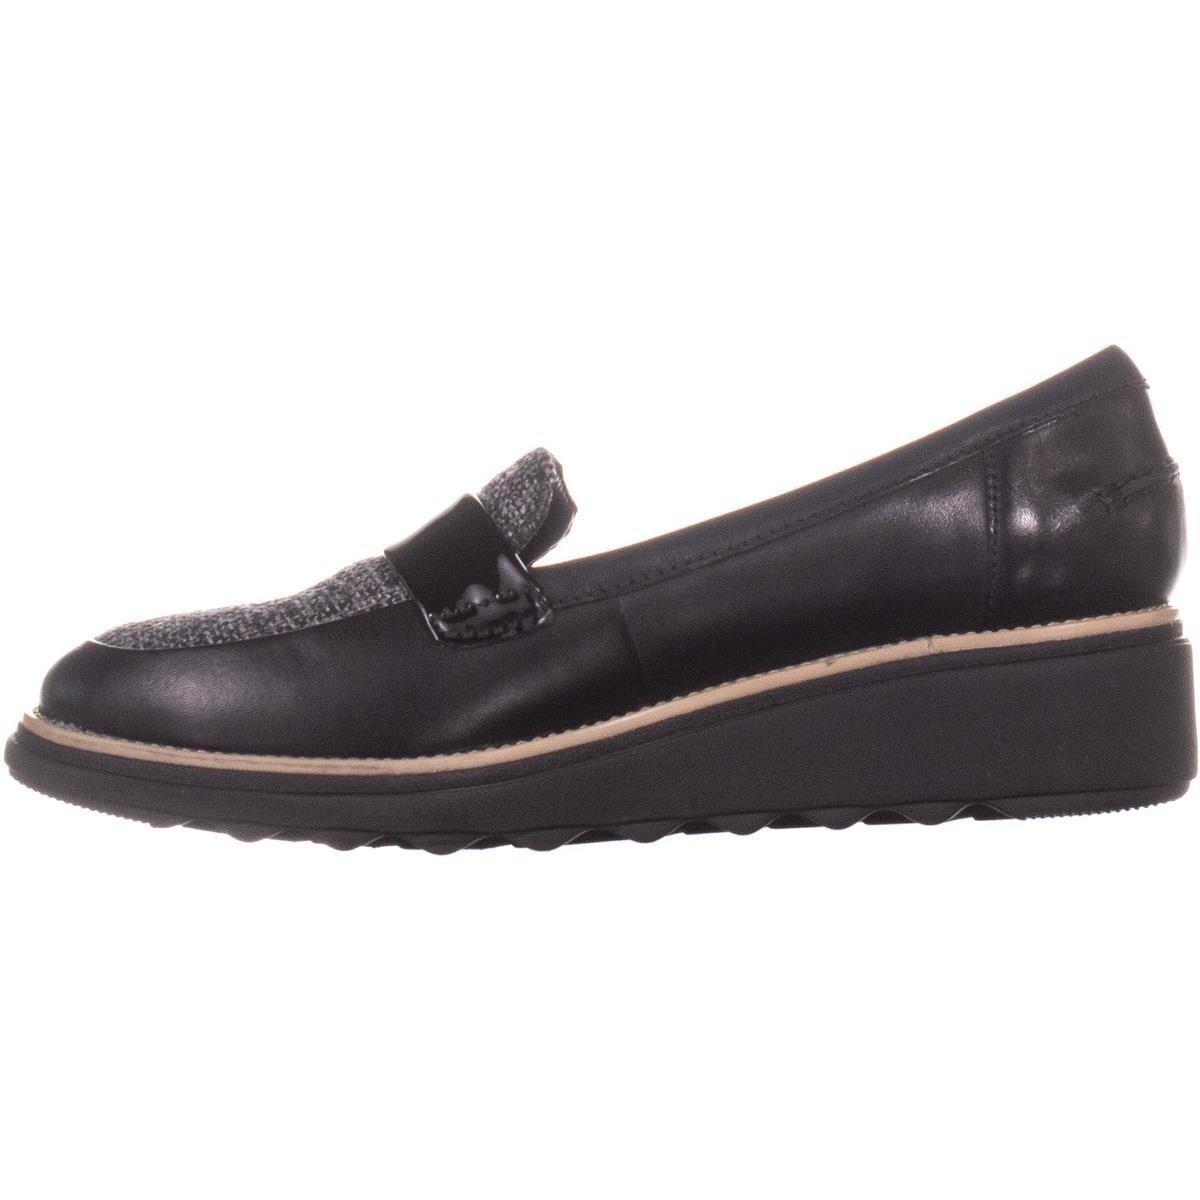 00e8d966619d Shop Clarks Sharon Gracie Slip On Loafers